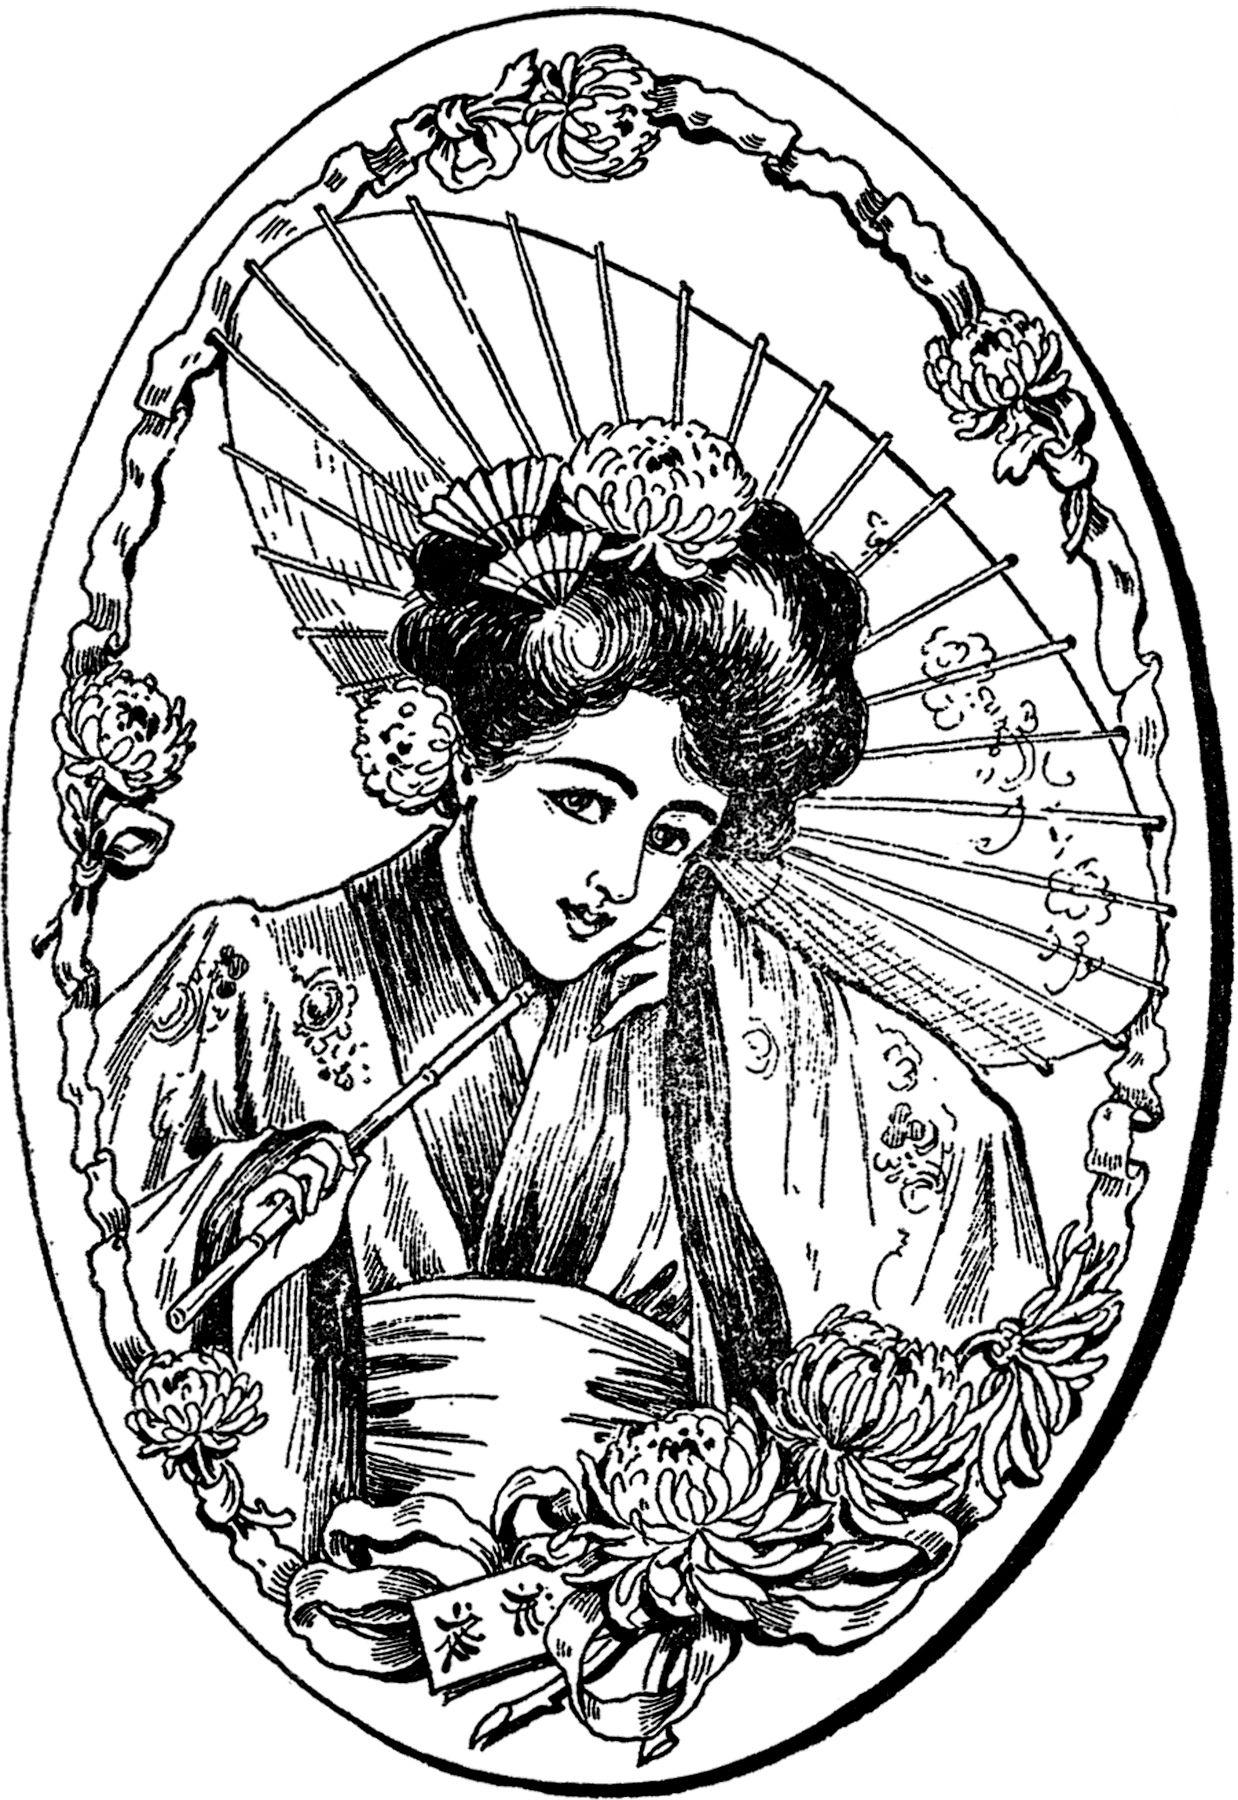 Coloriage Adulte Geisha.Beautiful Vintage Geisha Lady Image Coloriage Coloriage